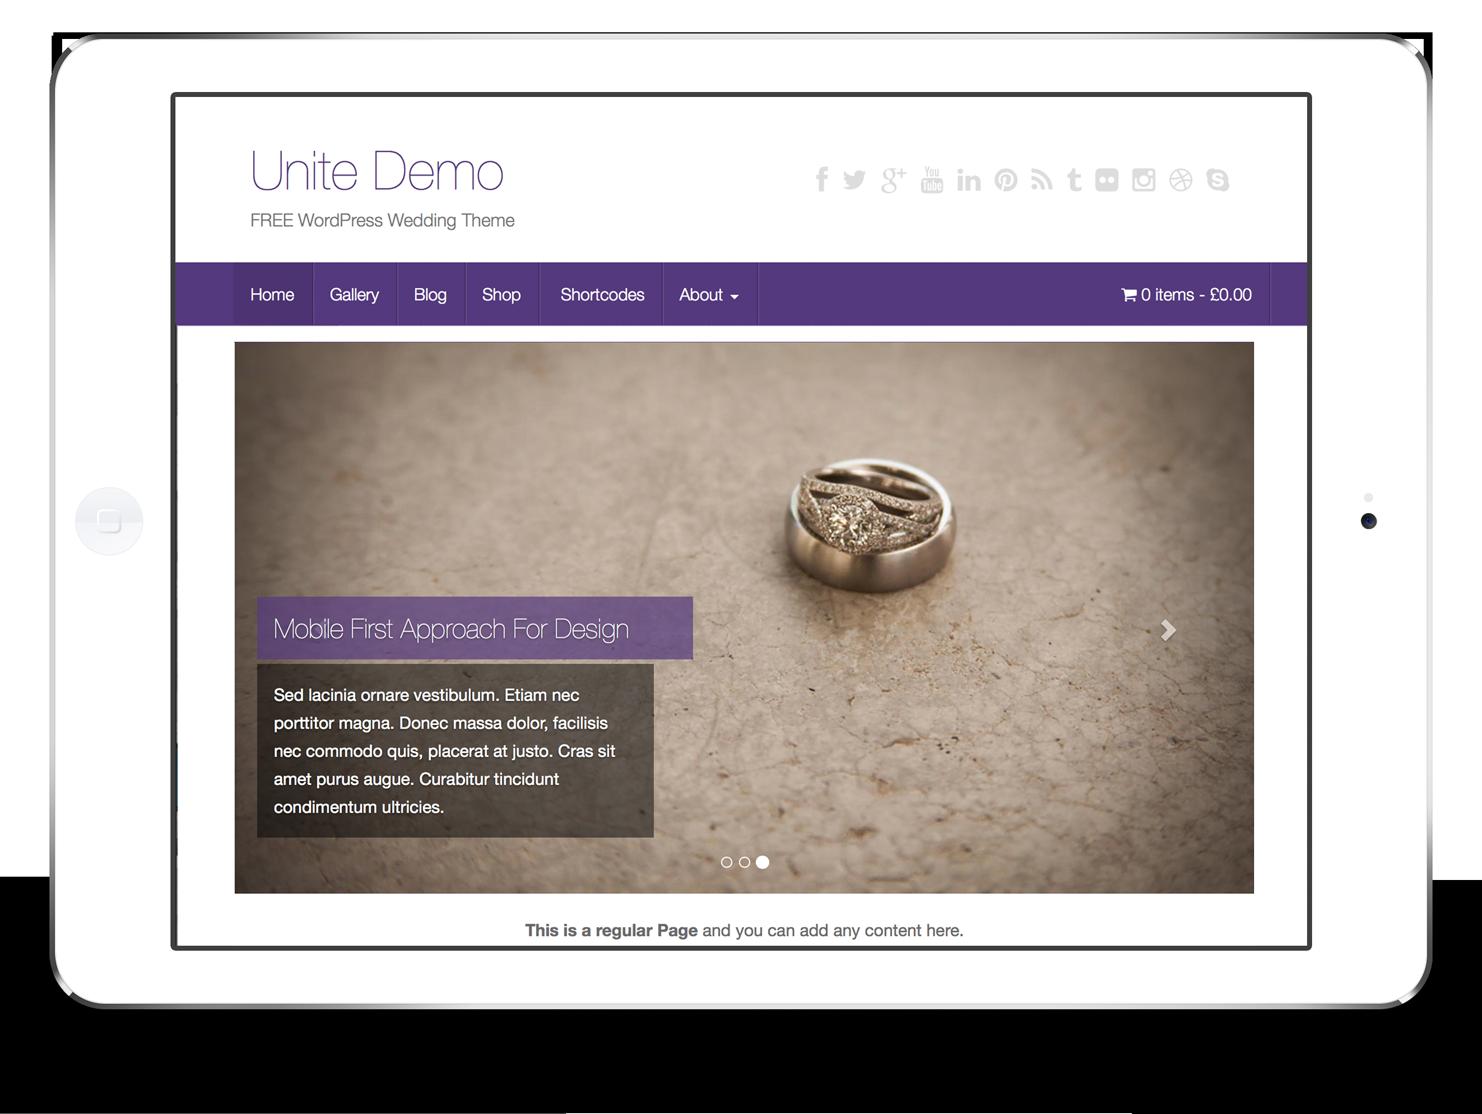 Unite - Colorlib | Wedding free WordPress themes | Pinterest ...